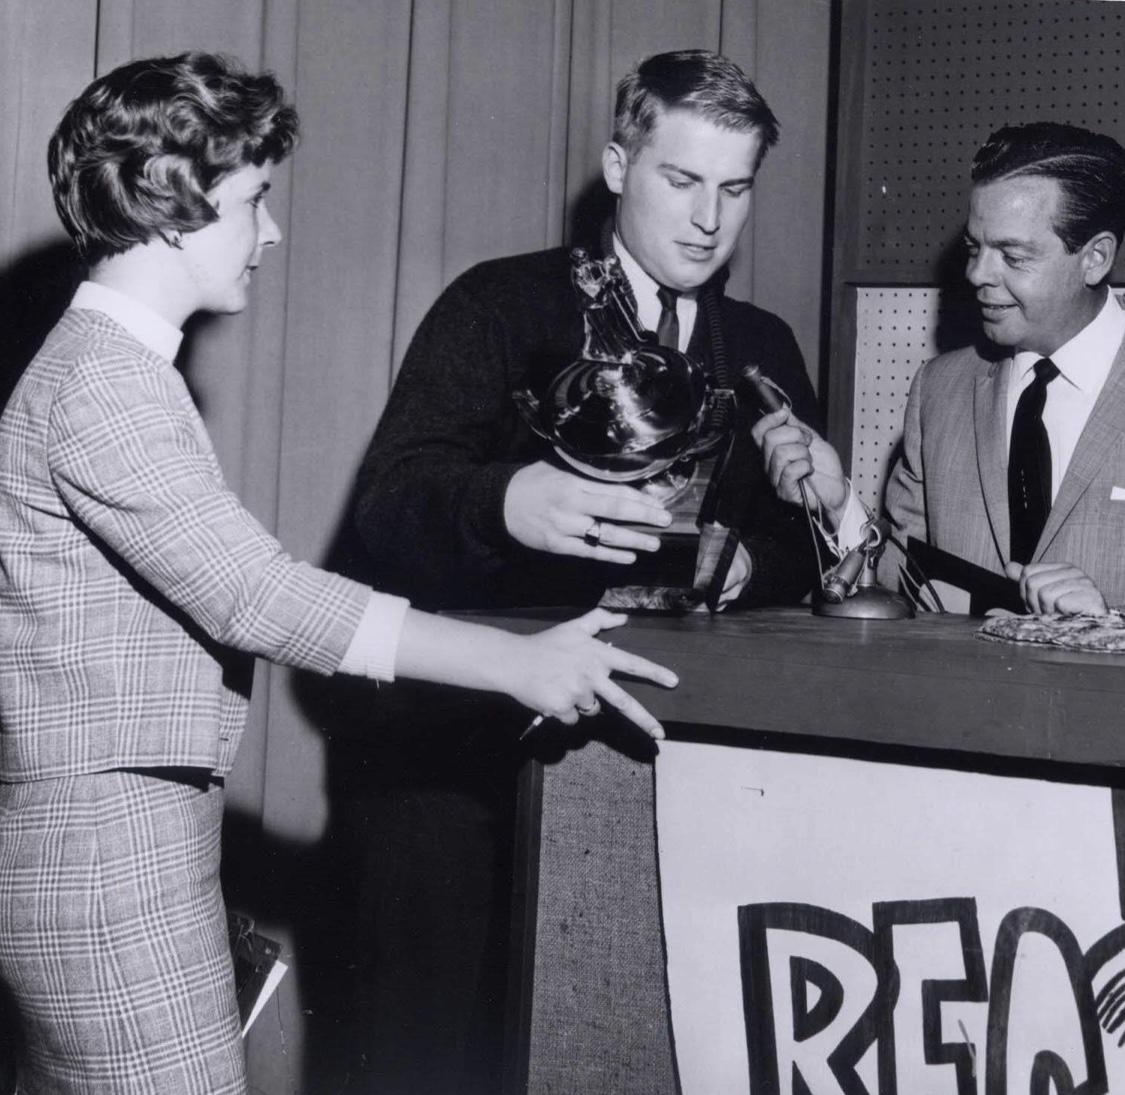 Longtime KNTV NBC Bay Area Employee Celebrates 60 Years at